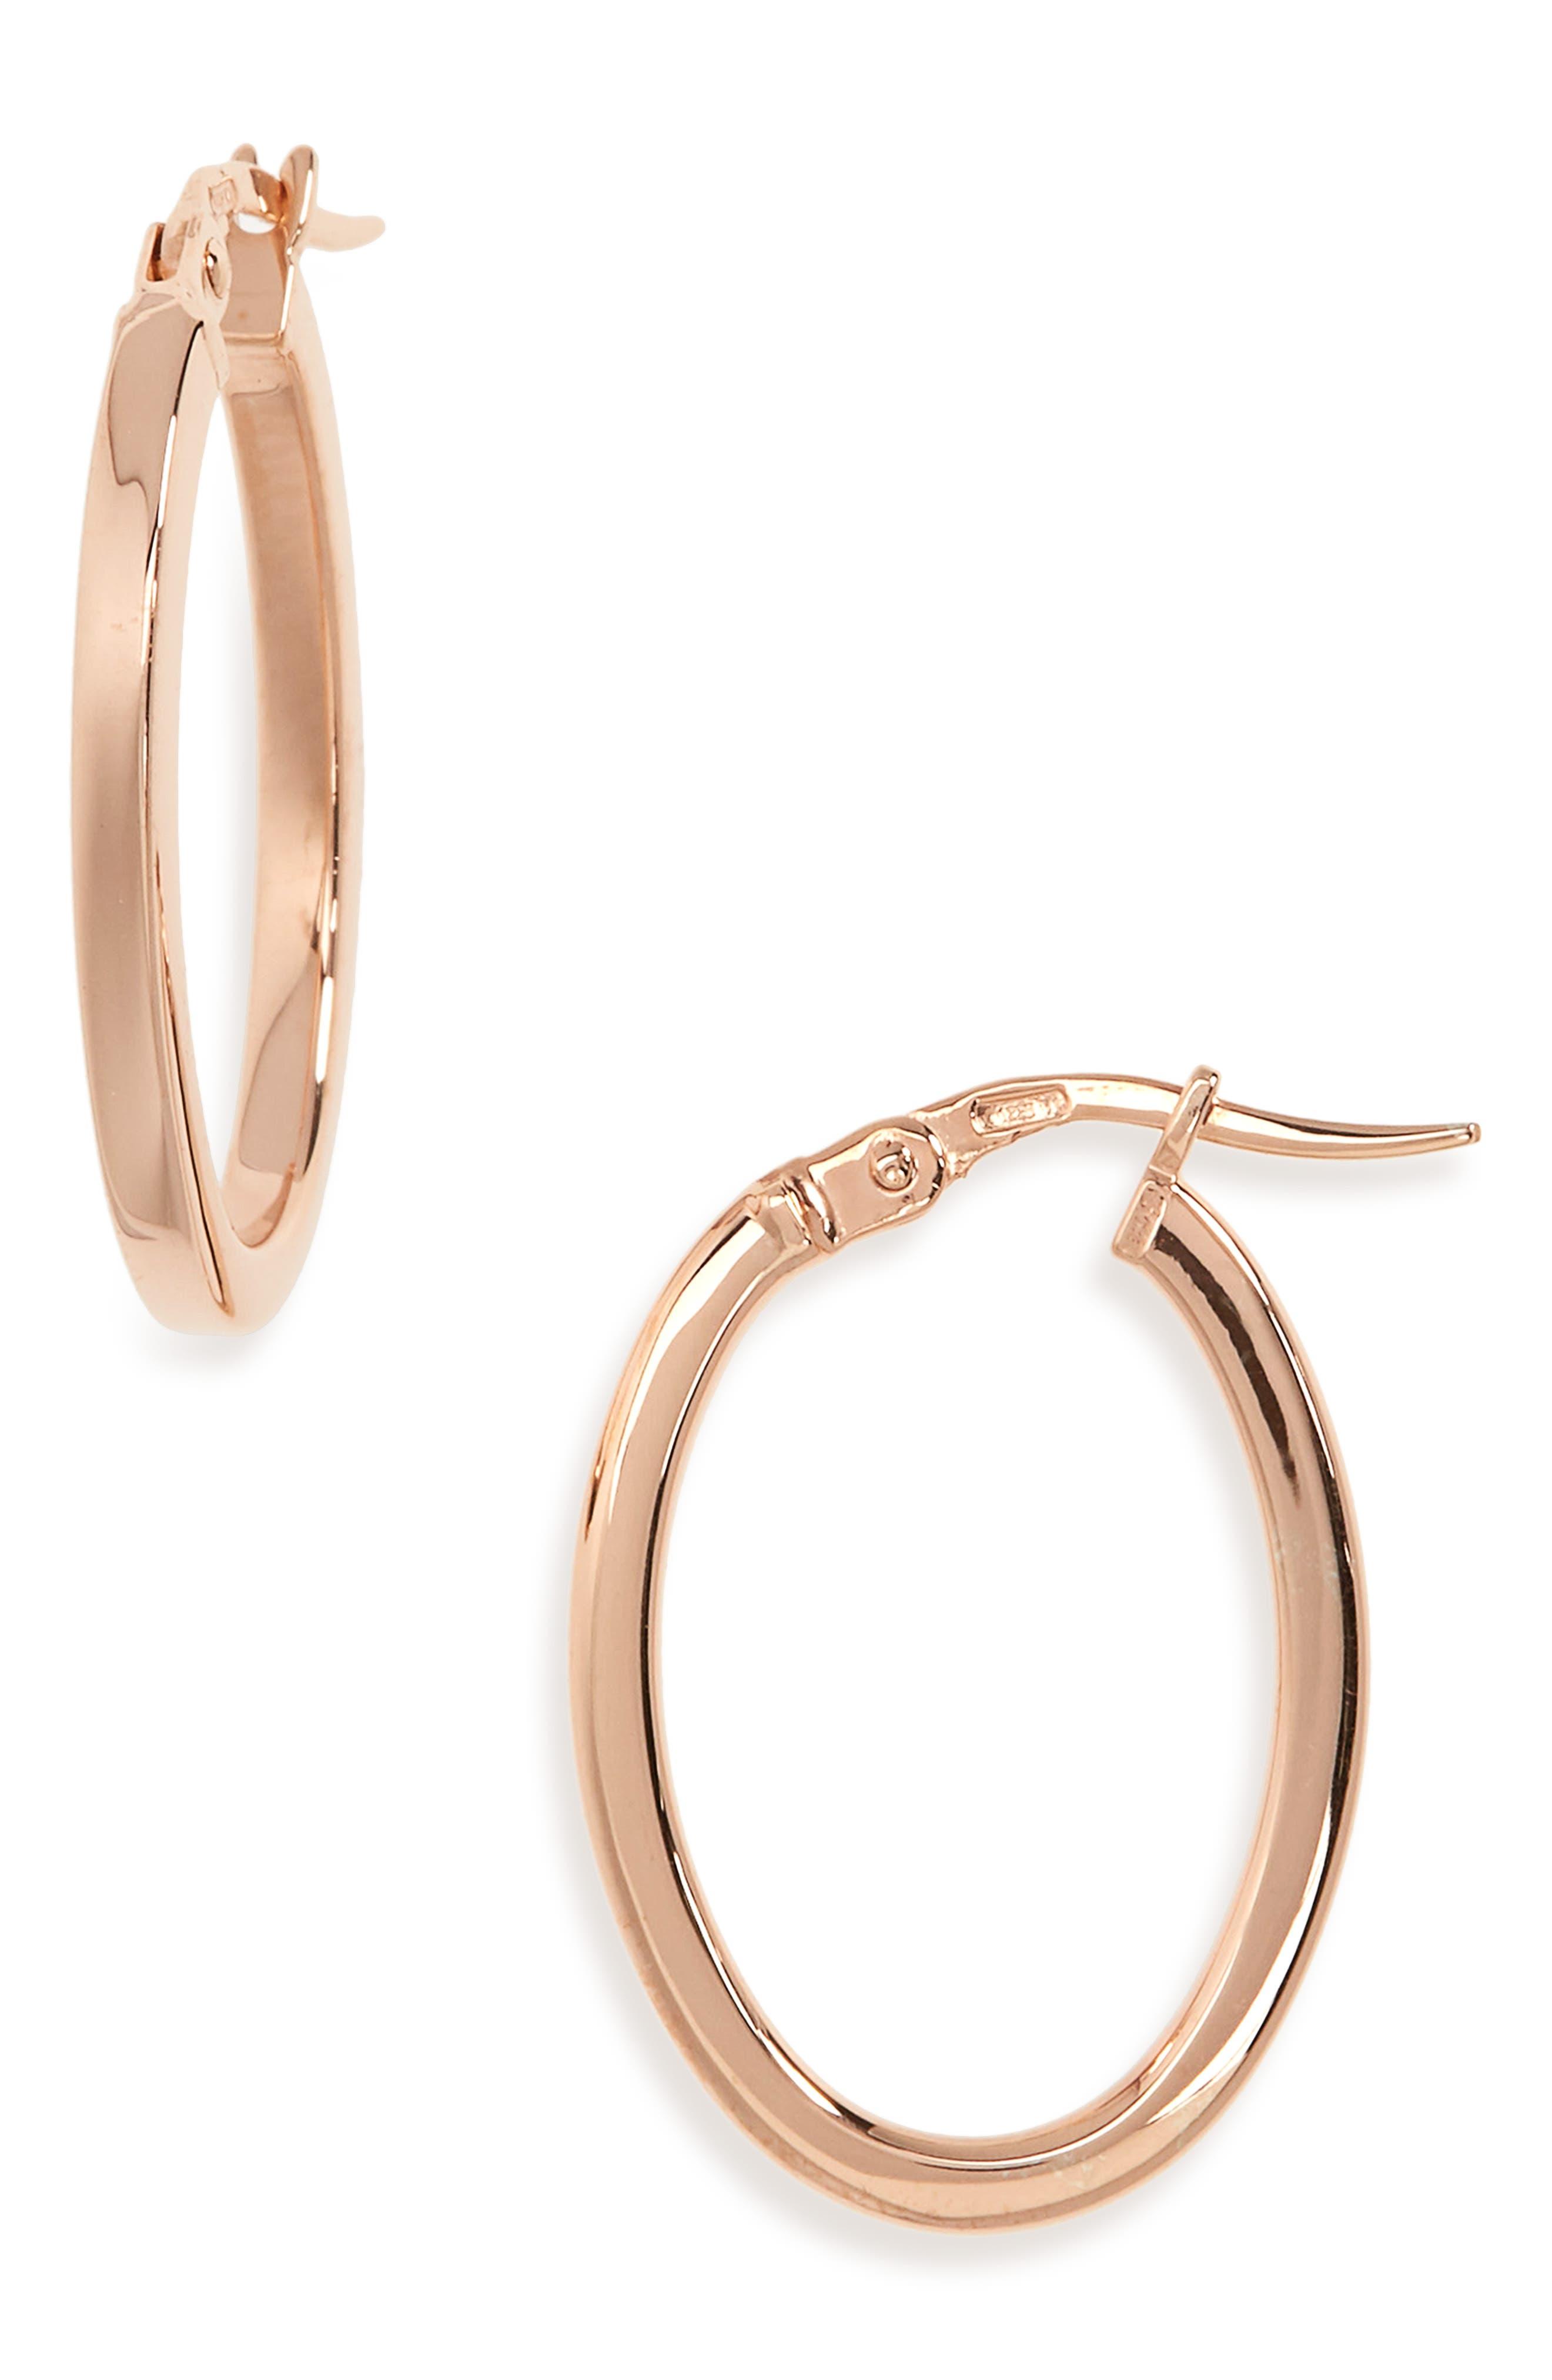 Medium Hoop Earrings,                         Main,                         color, ROSE GOLD